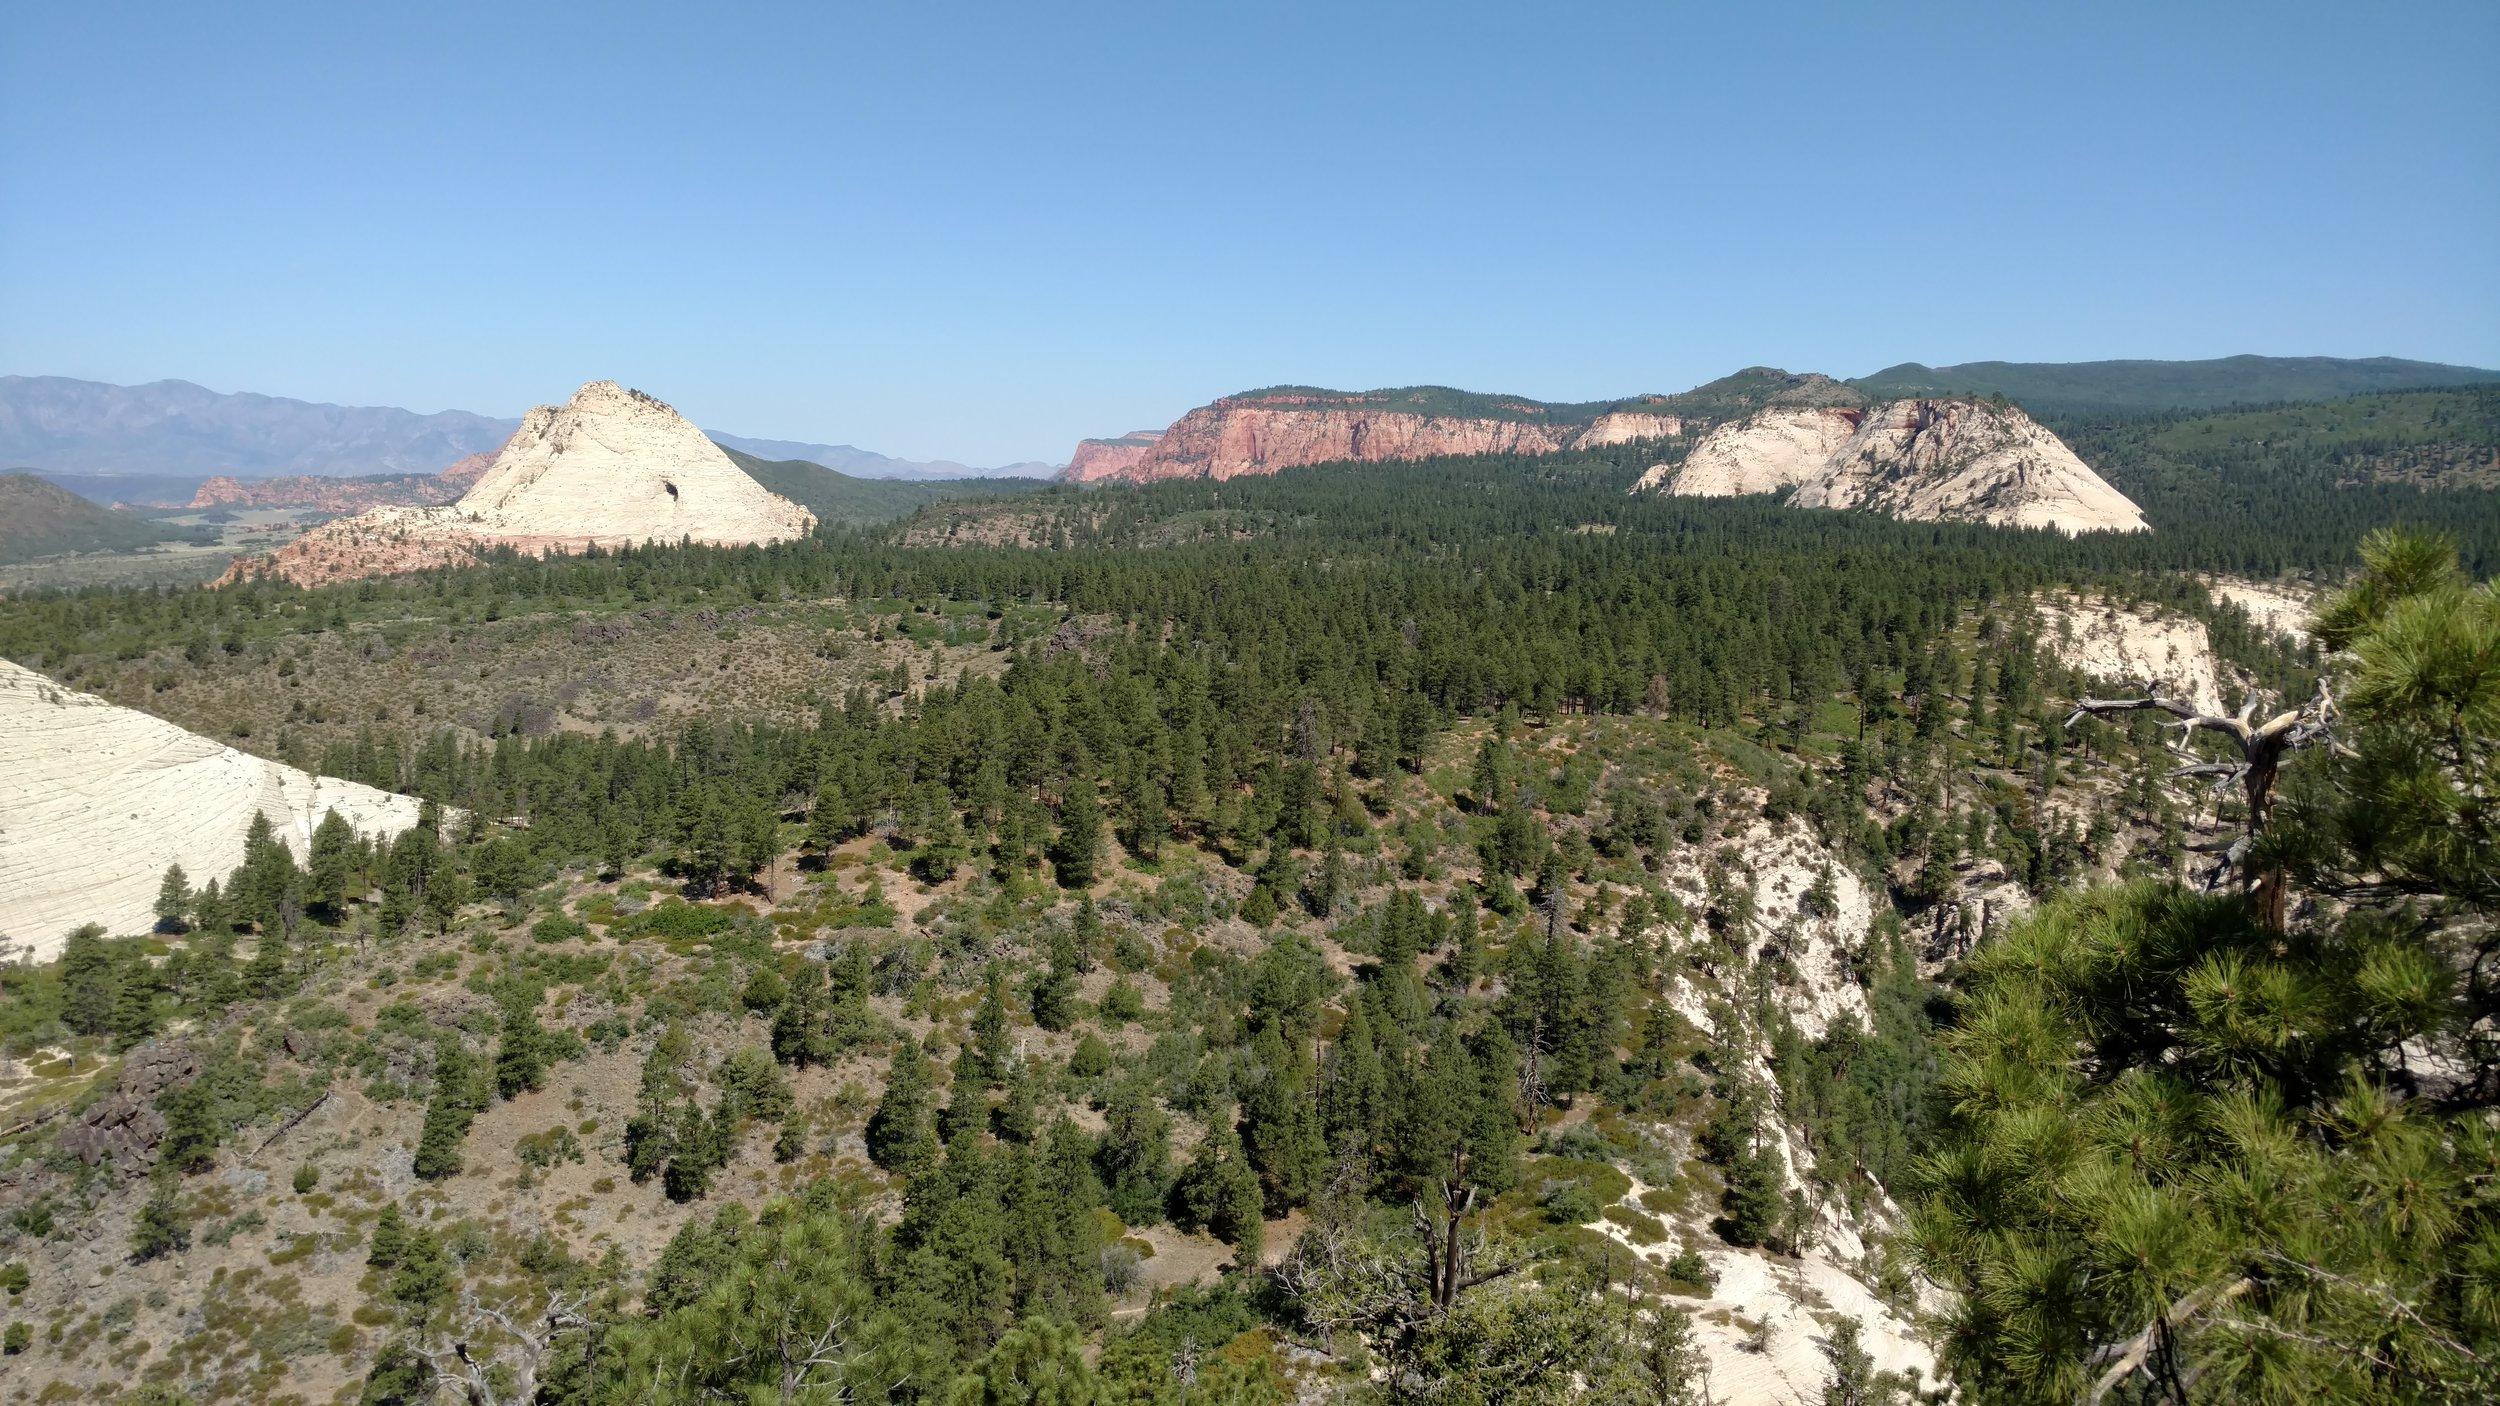 Peak to Peak view. Wildcat trailhead sits near the base of Pine Valley Peak (picture left)